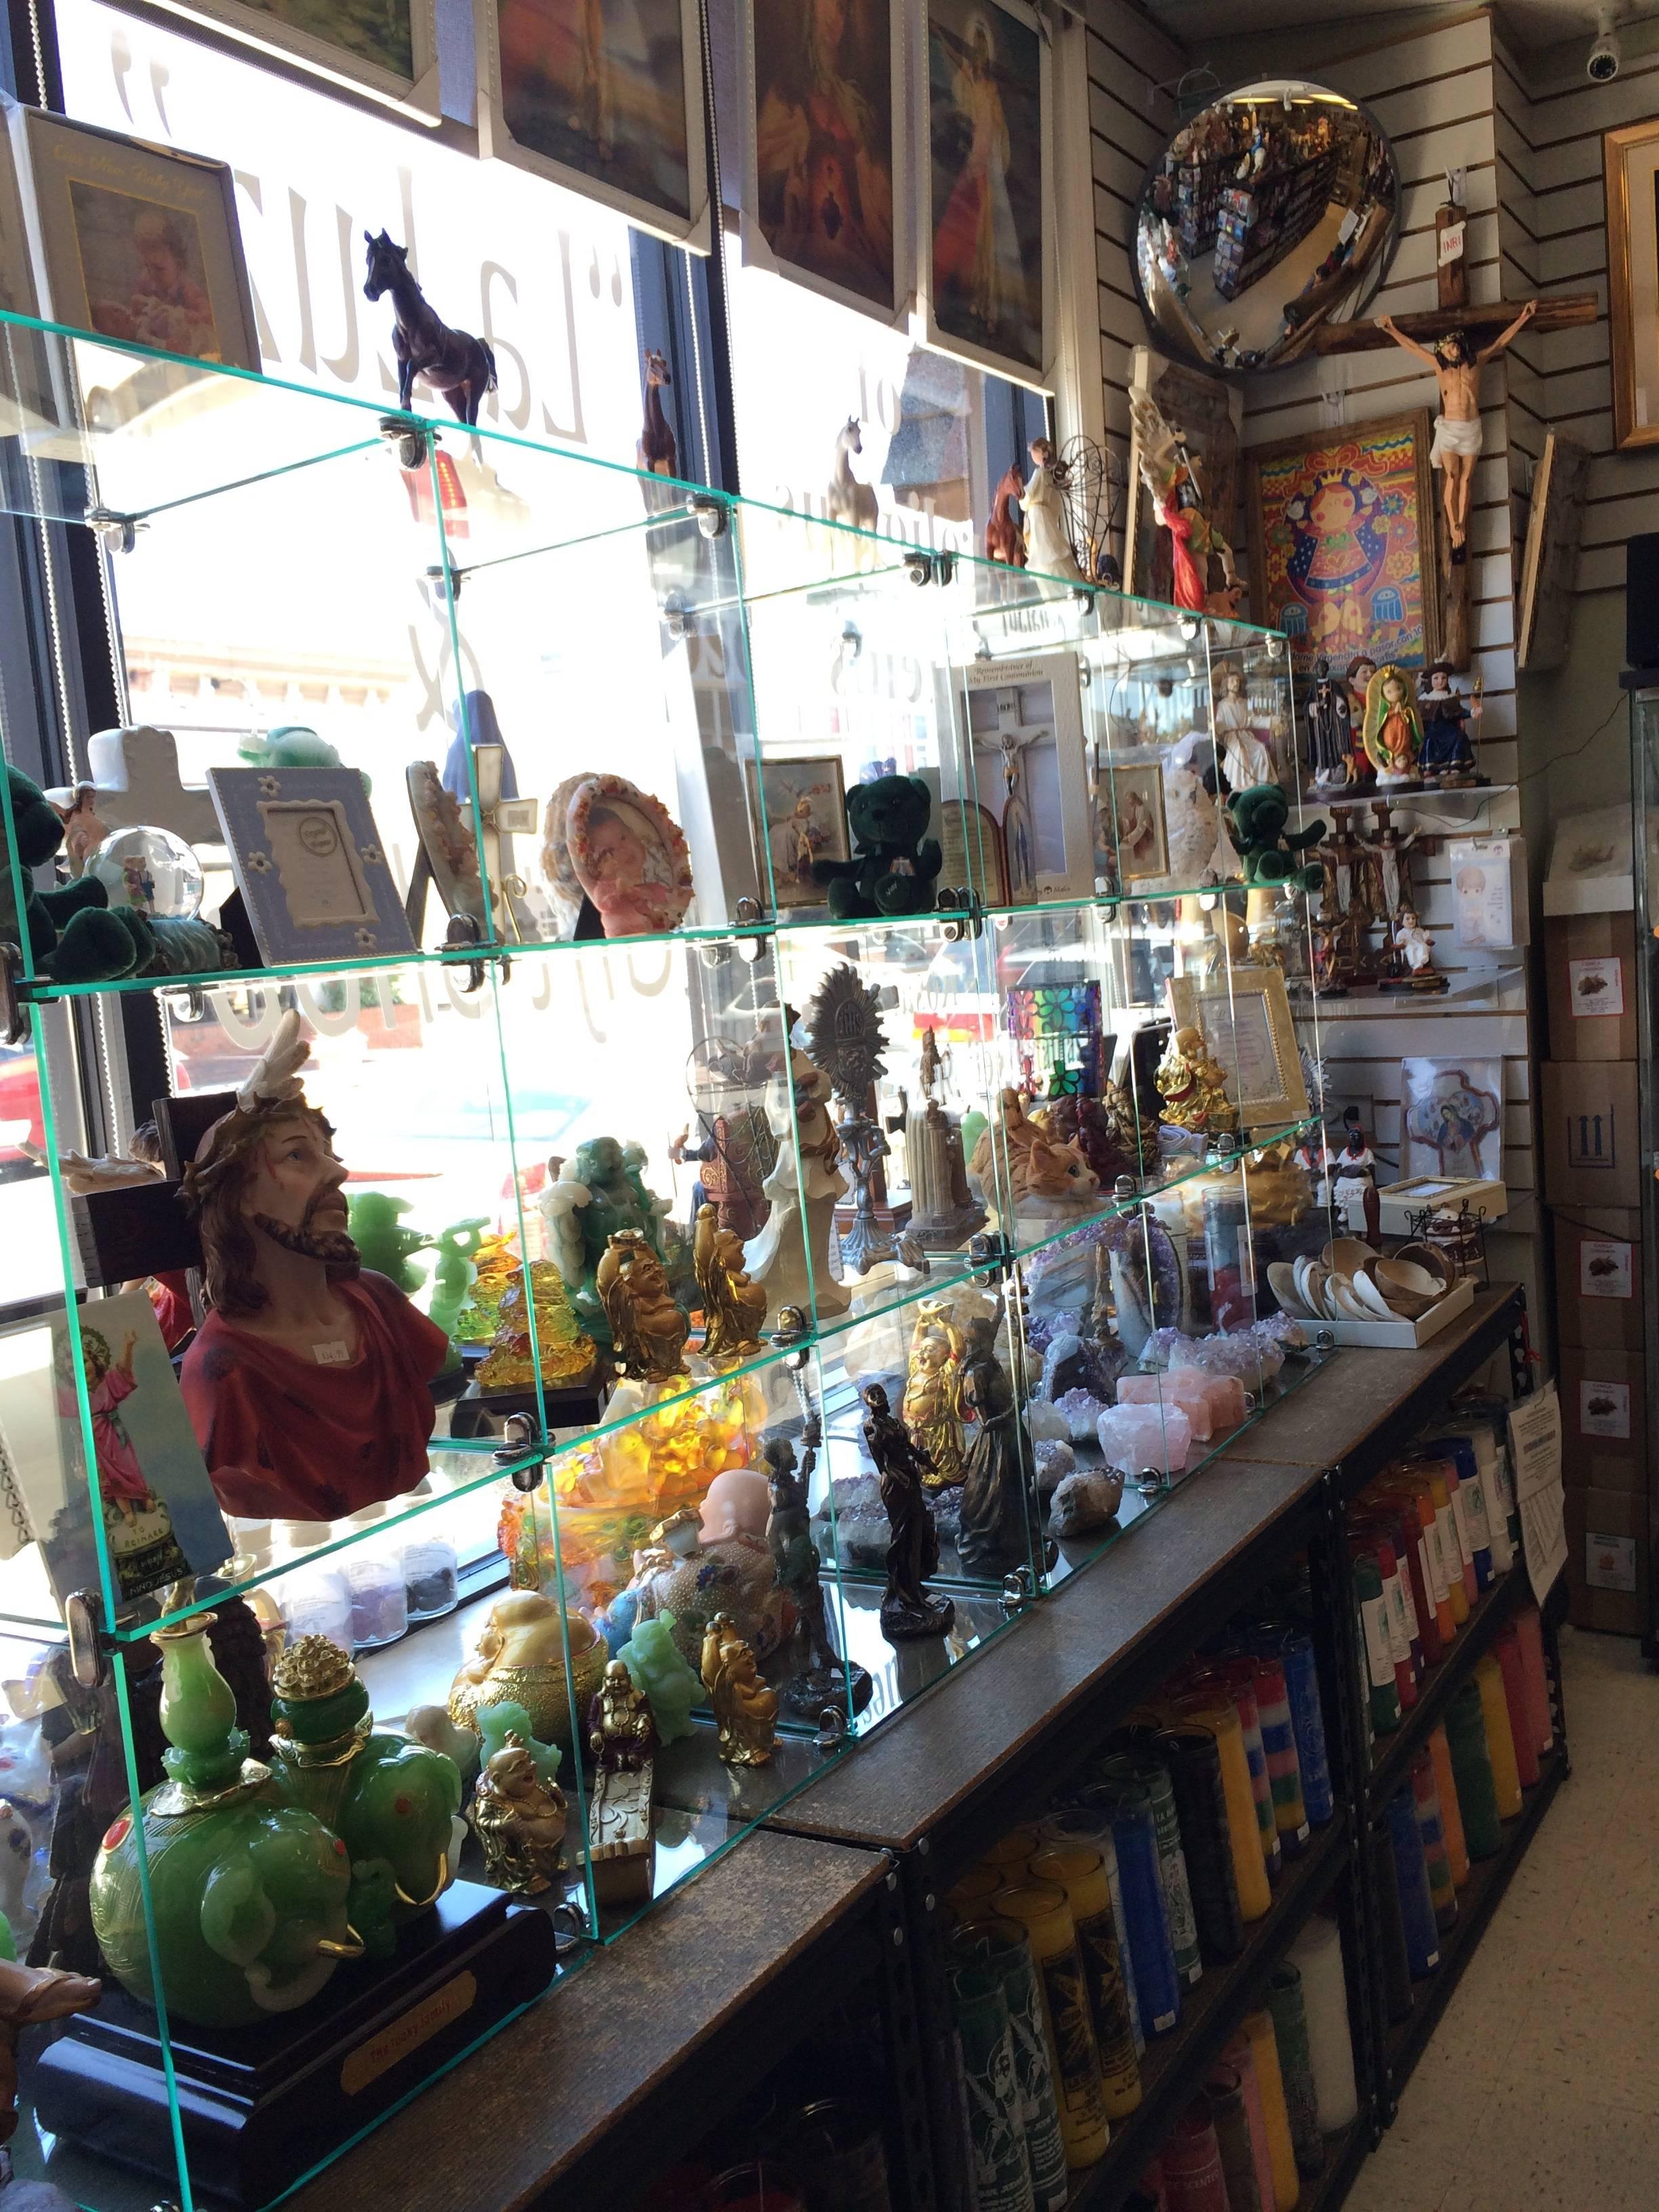 Westbury New York Alternative And Metaphysical Store: B